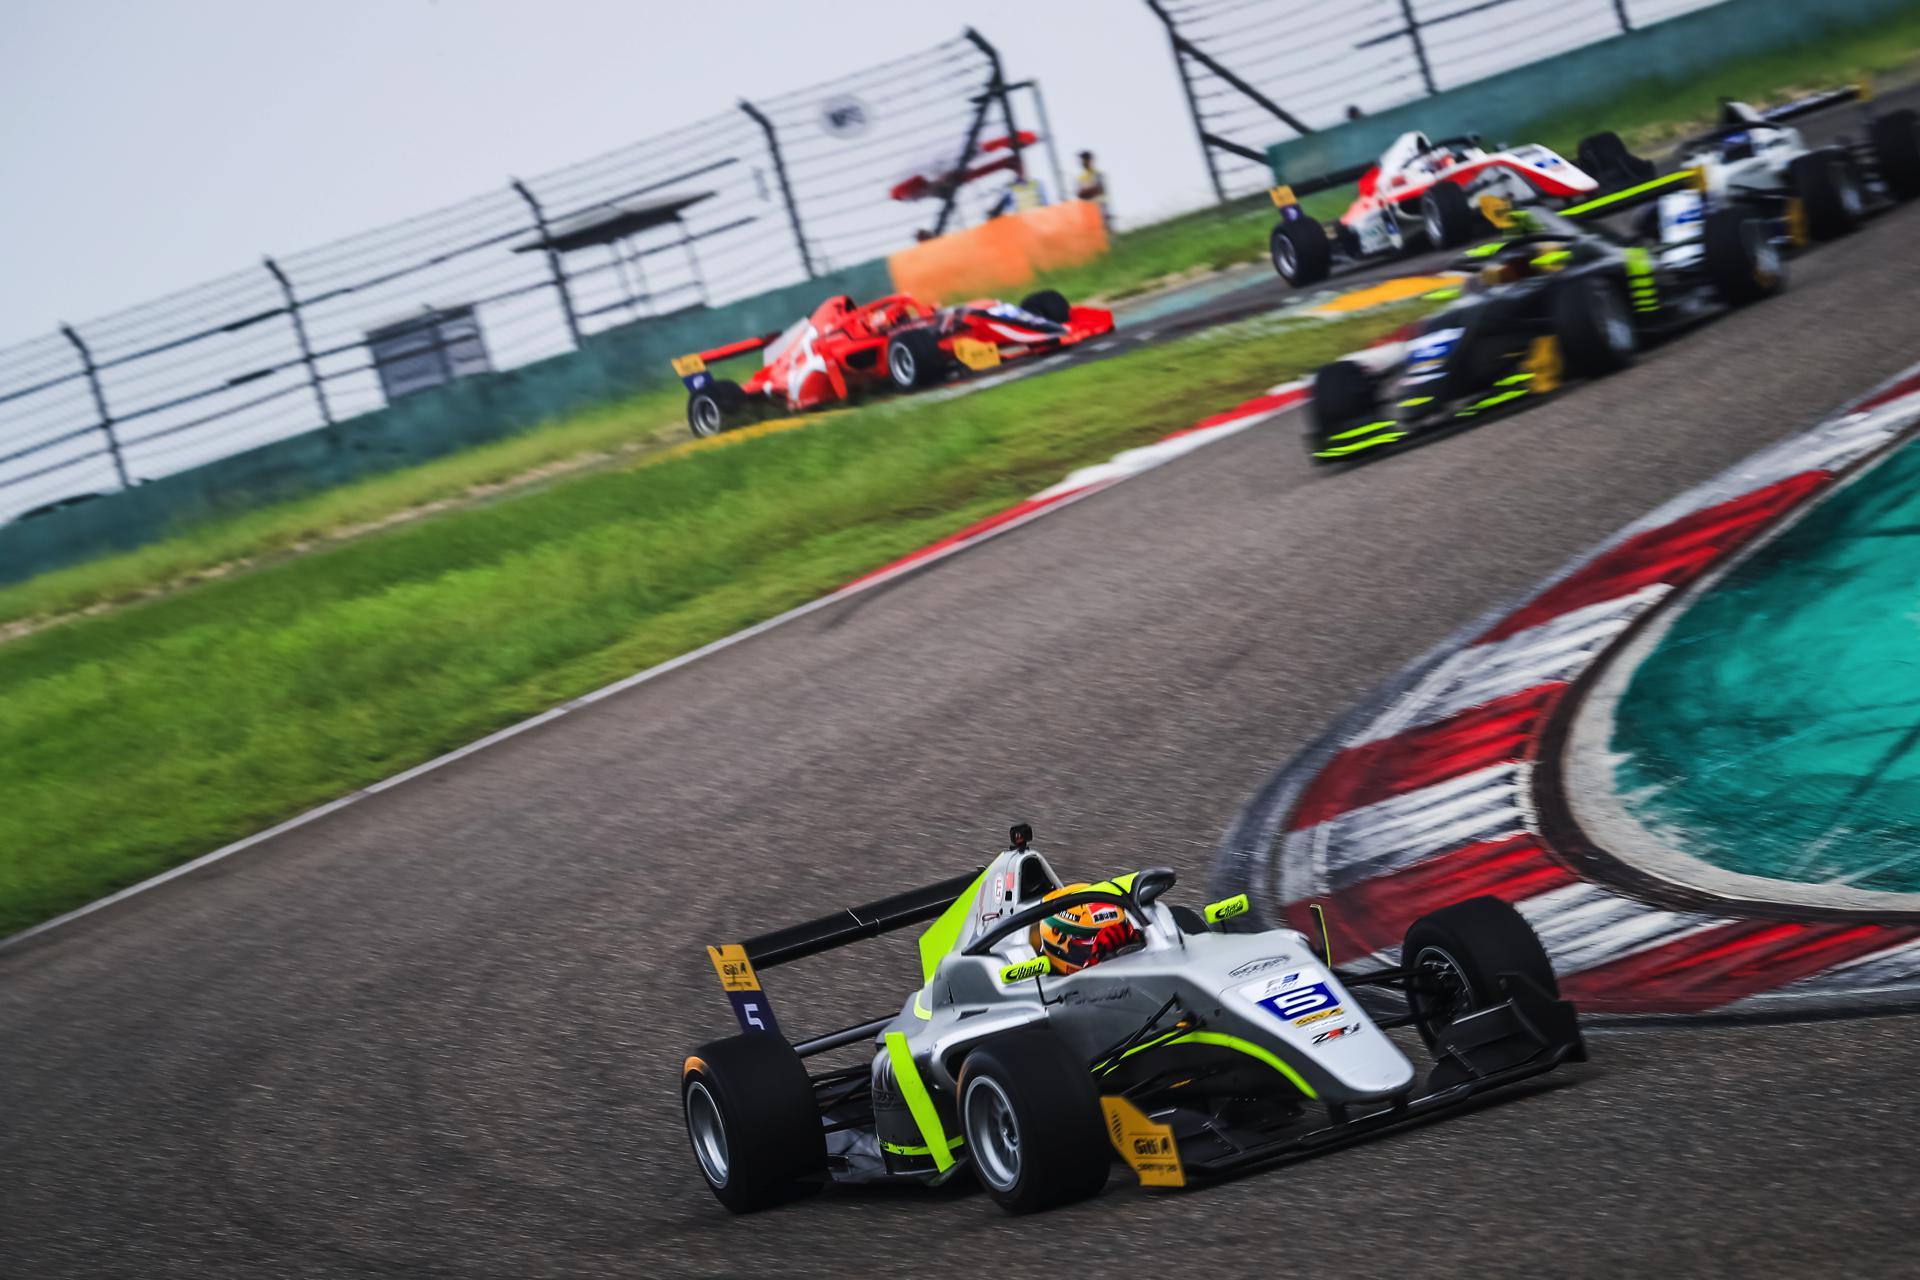 F3上海站余快神勇发挥 意外故障难挡Zen赛车势头